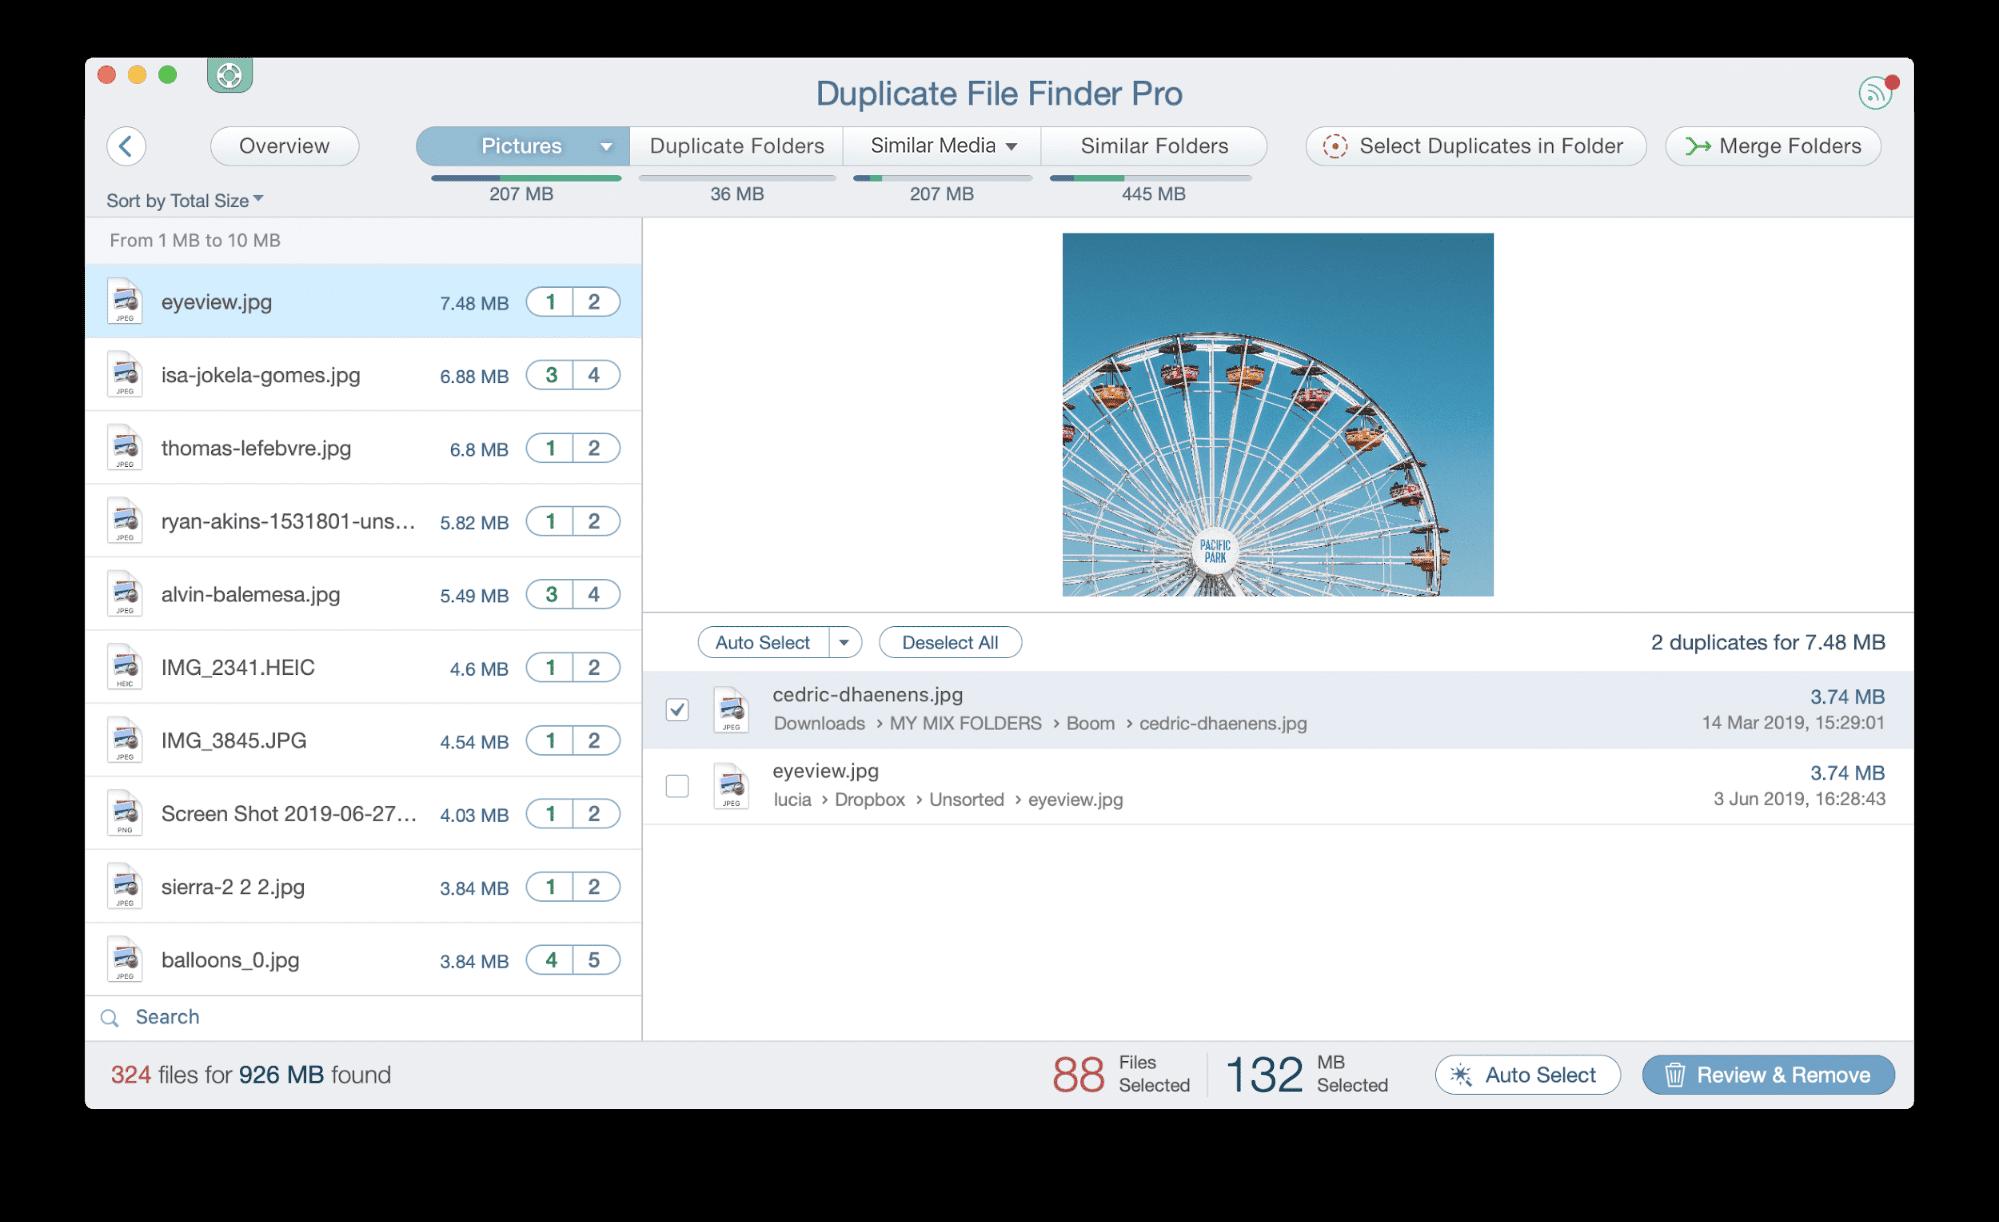 duplicate file finder app showing dupe photos